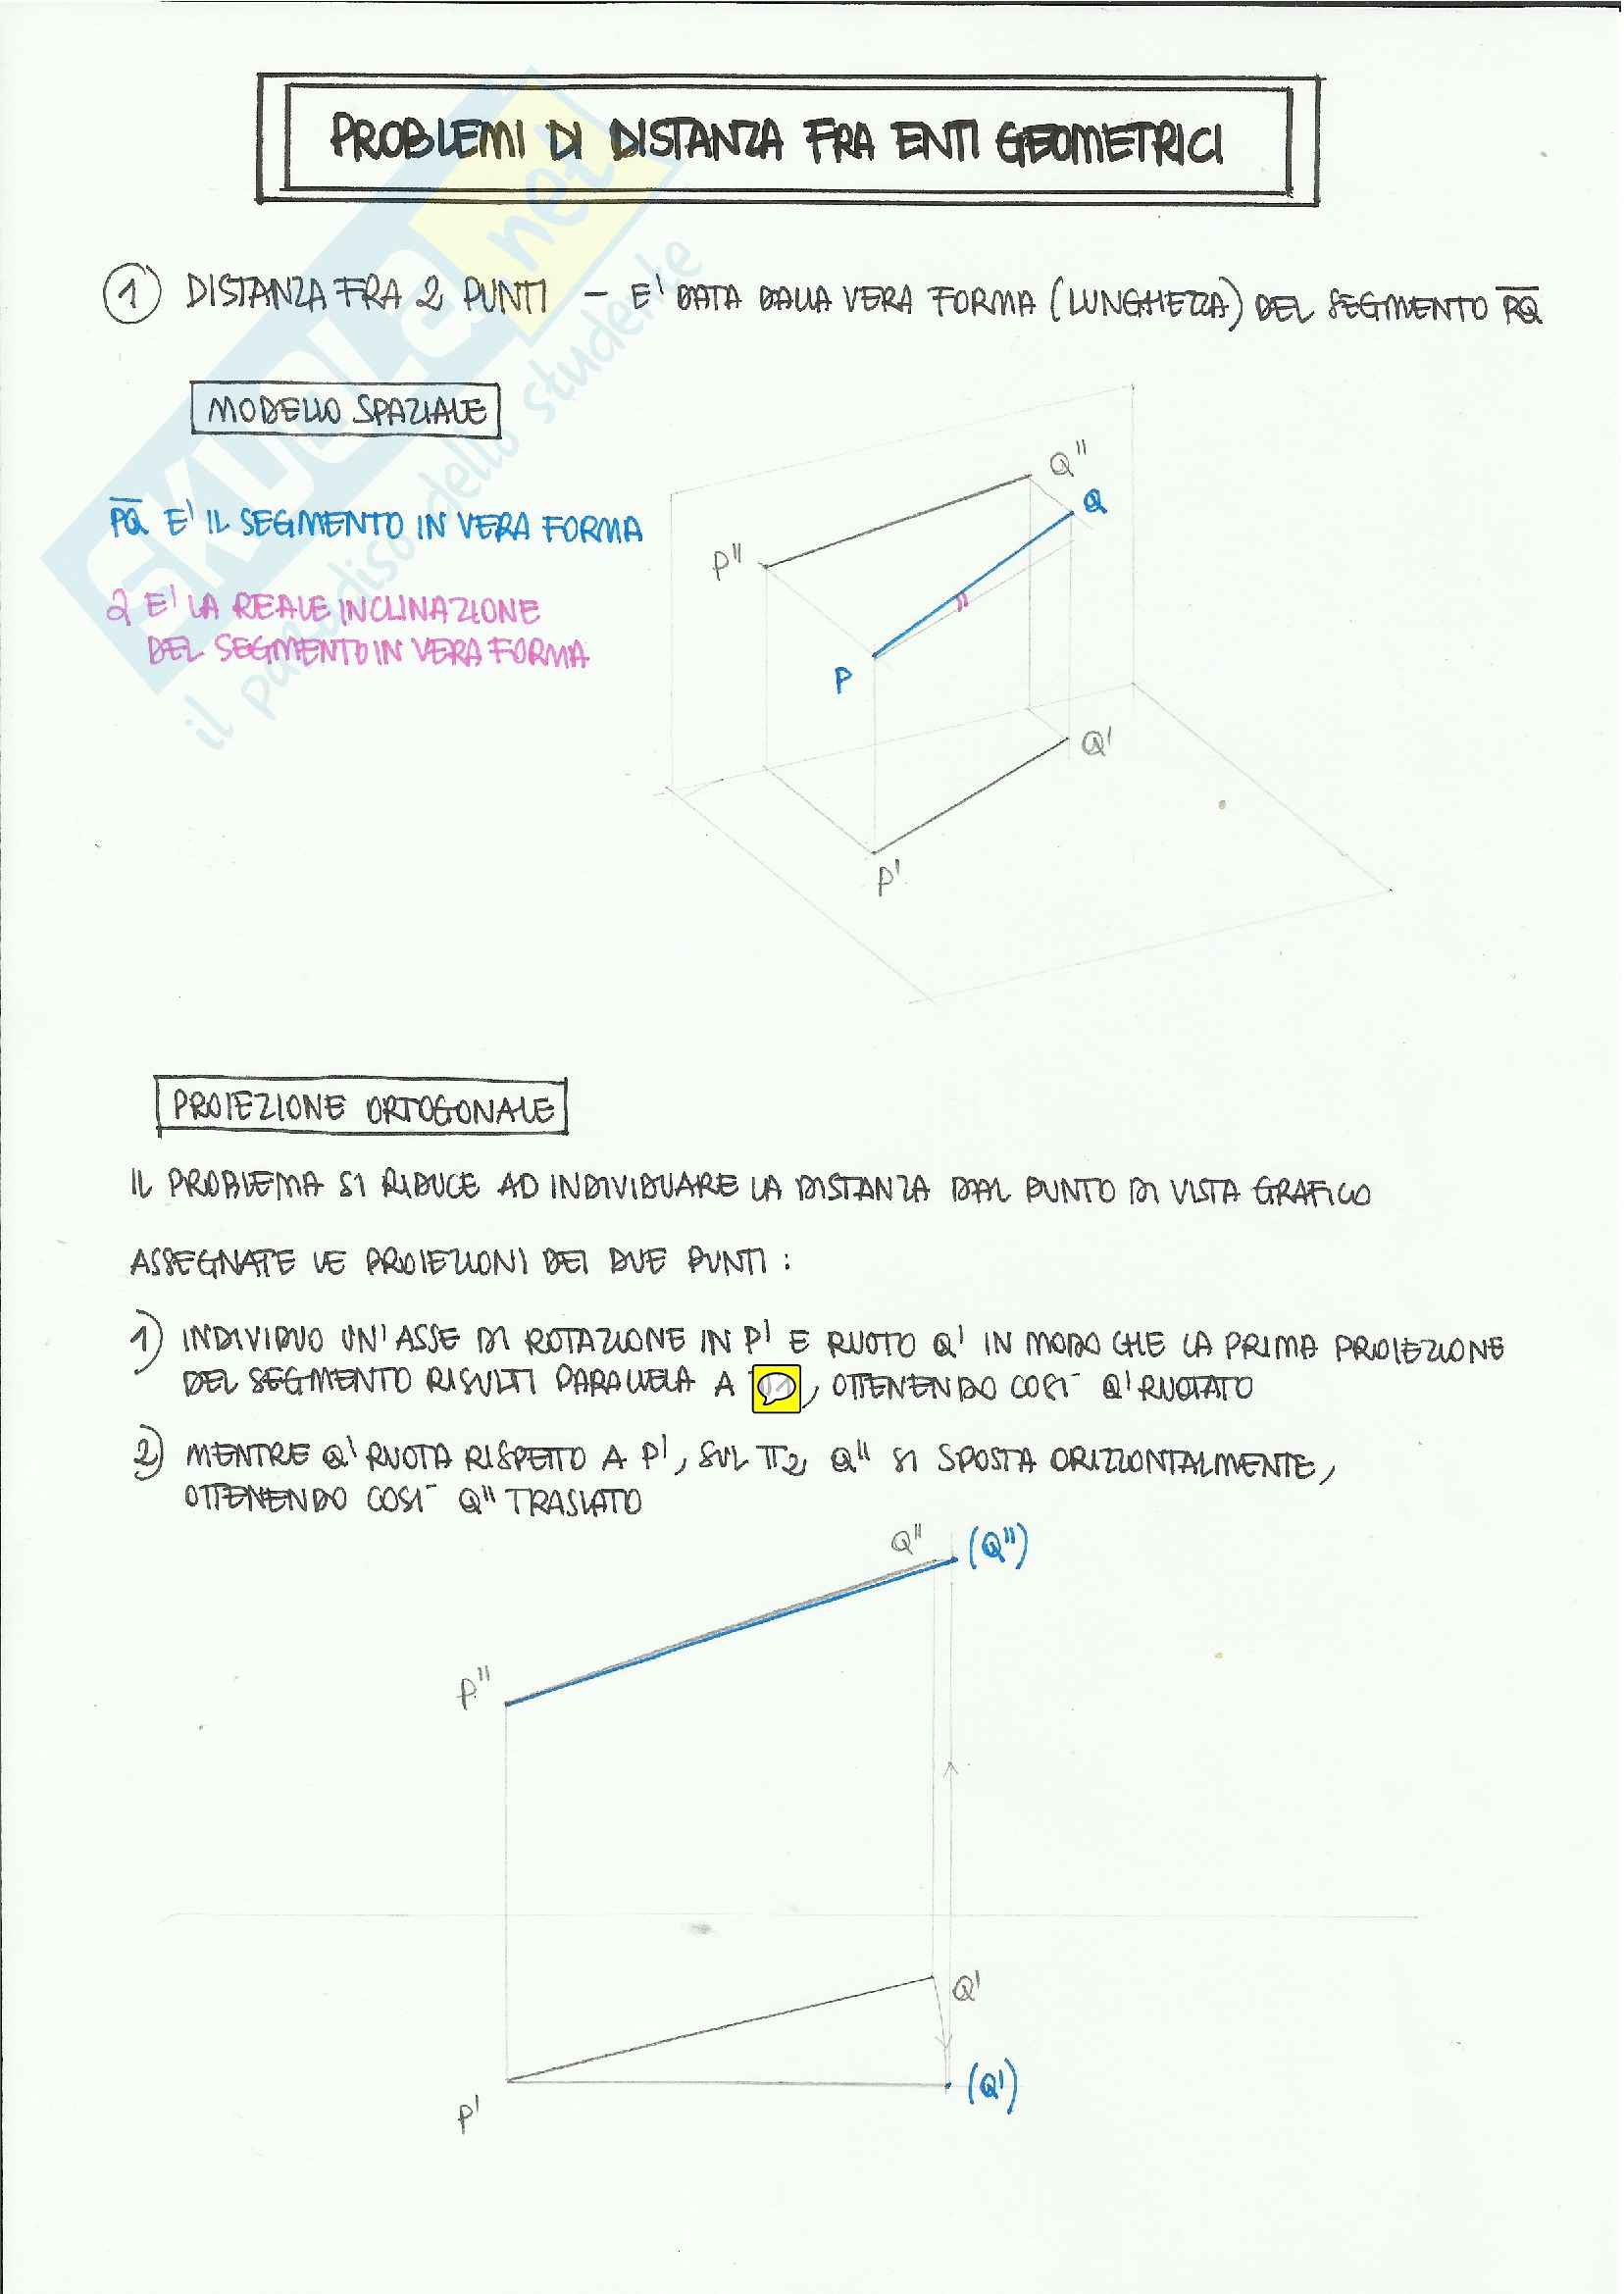 Problemi di distanza fra enti geometrici: Appunti di Disegno